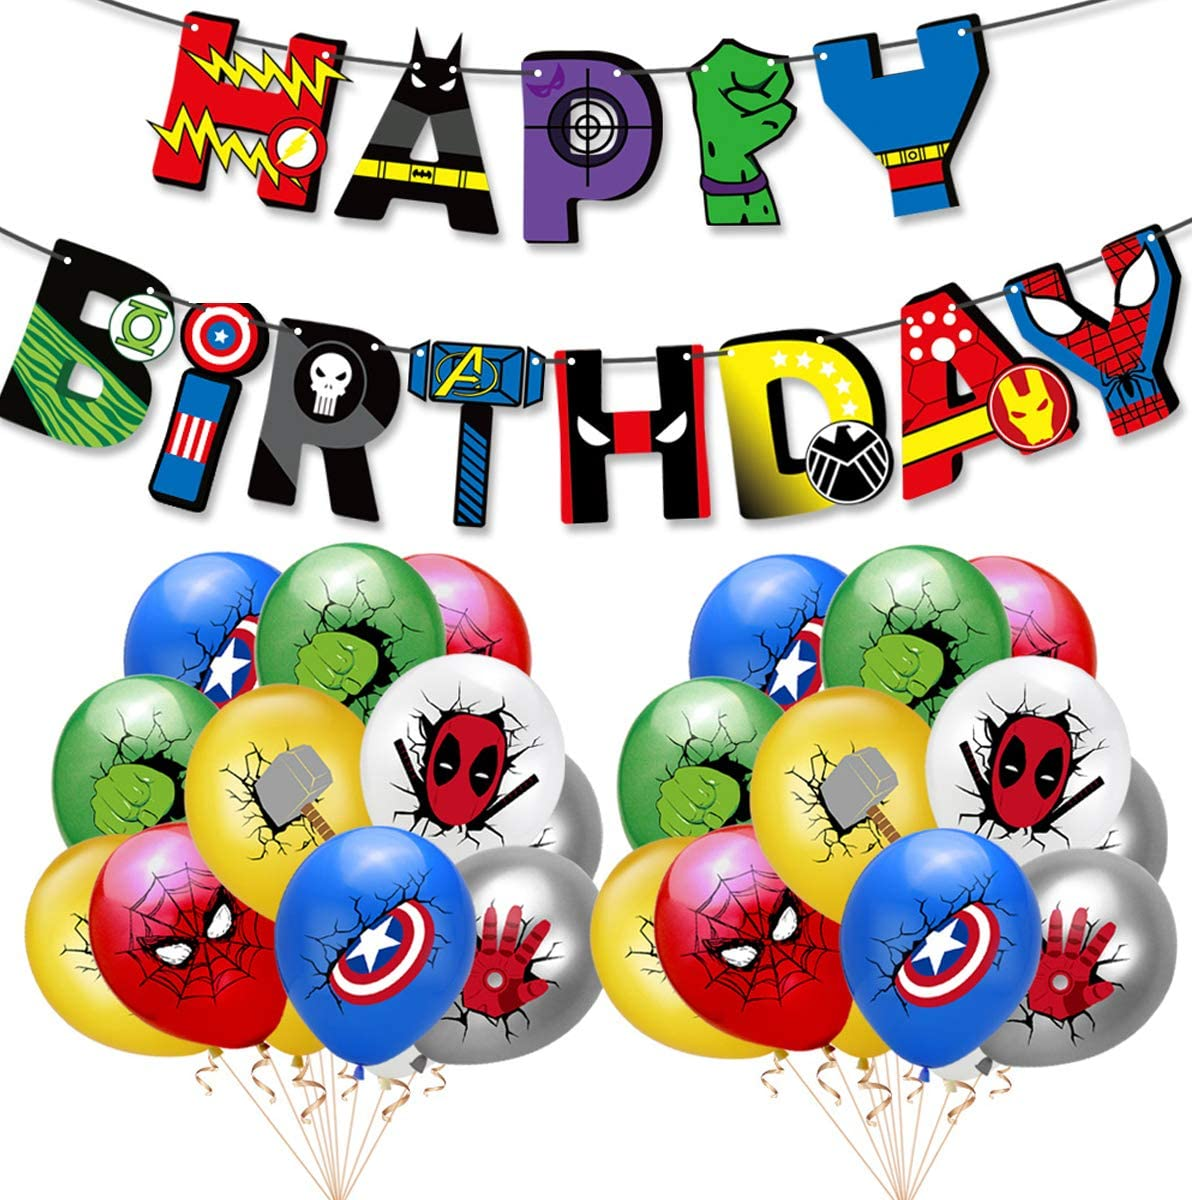 Superhero birthday banners, superhero balloons, superhero birthday party decorations